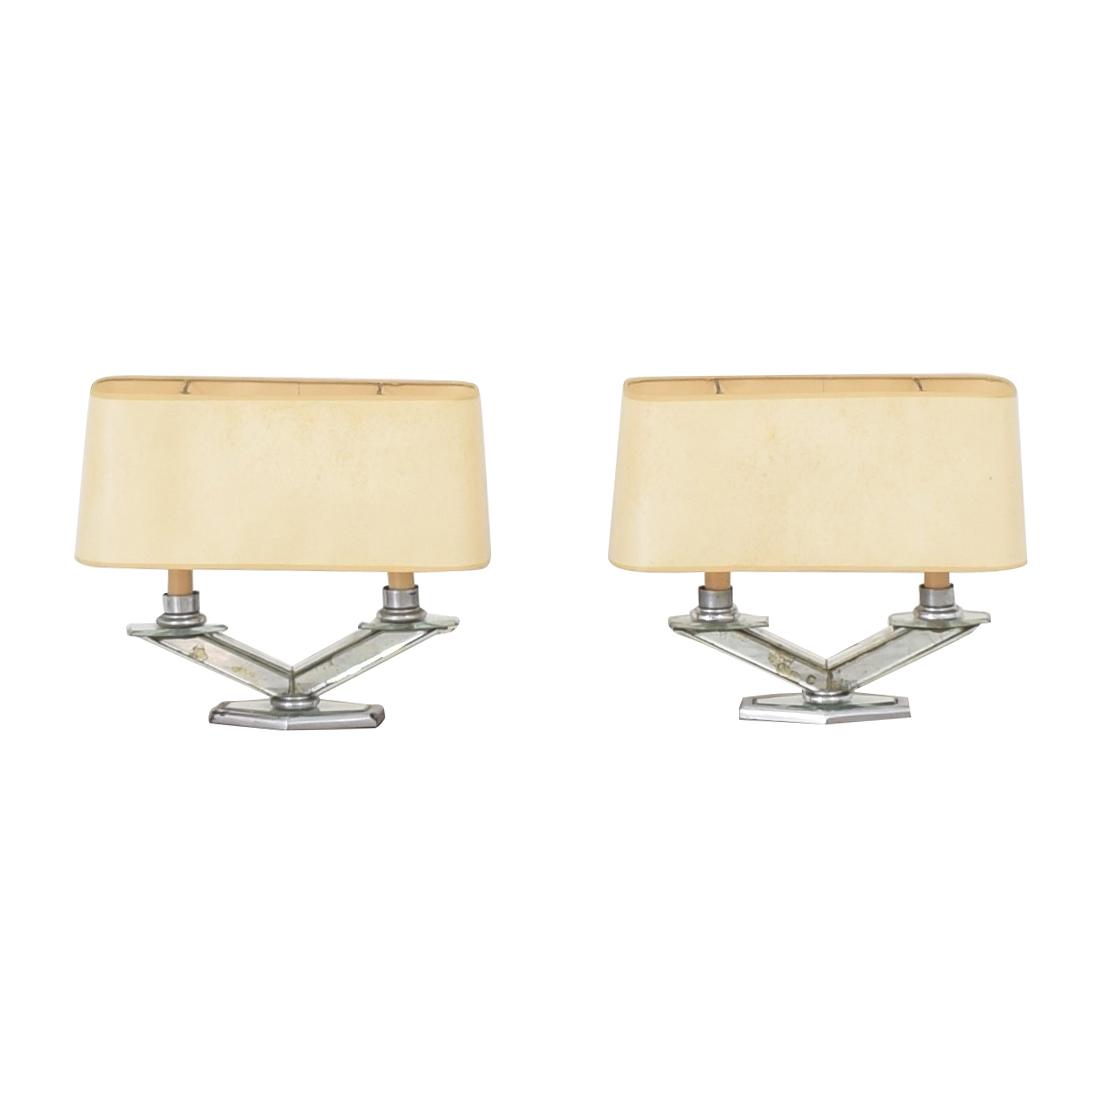 Vintage Style Table Lamps Decor